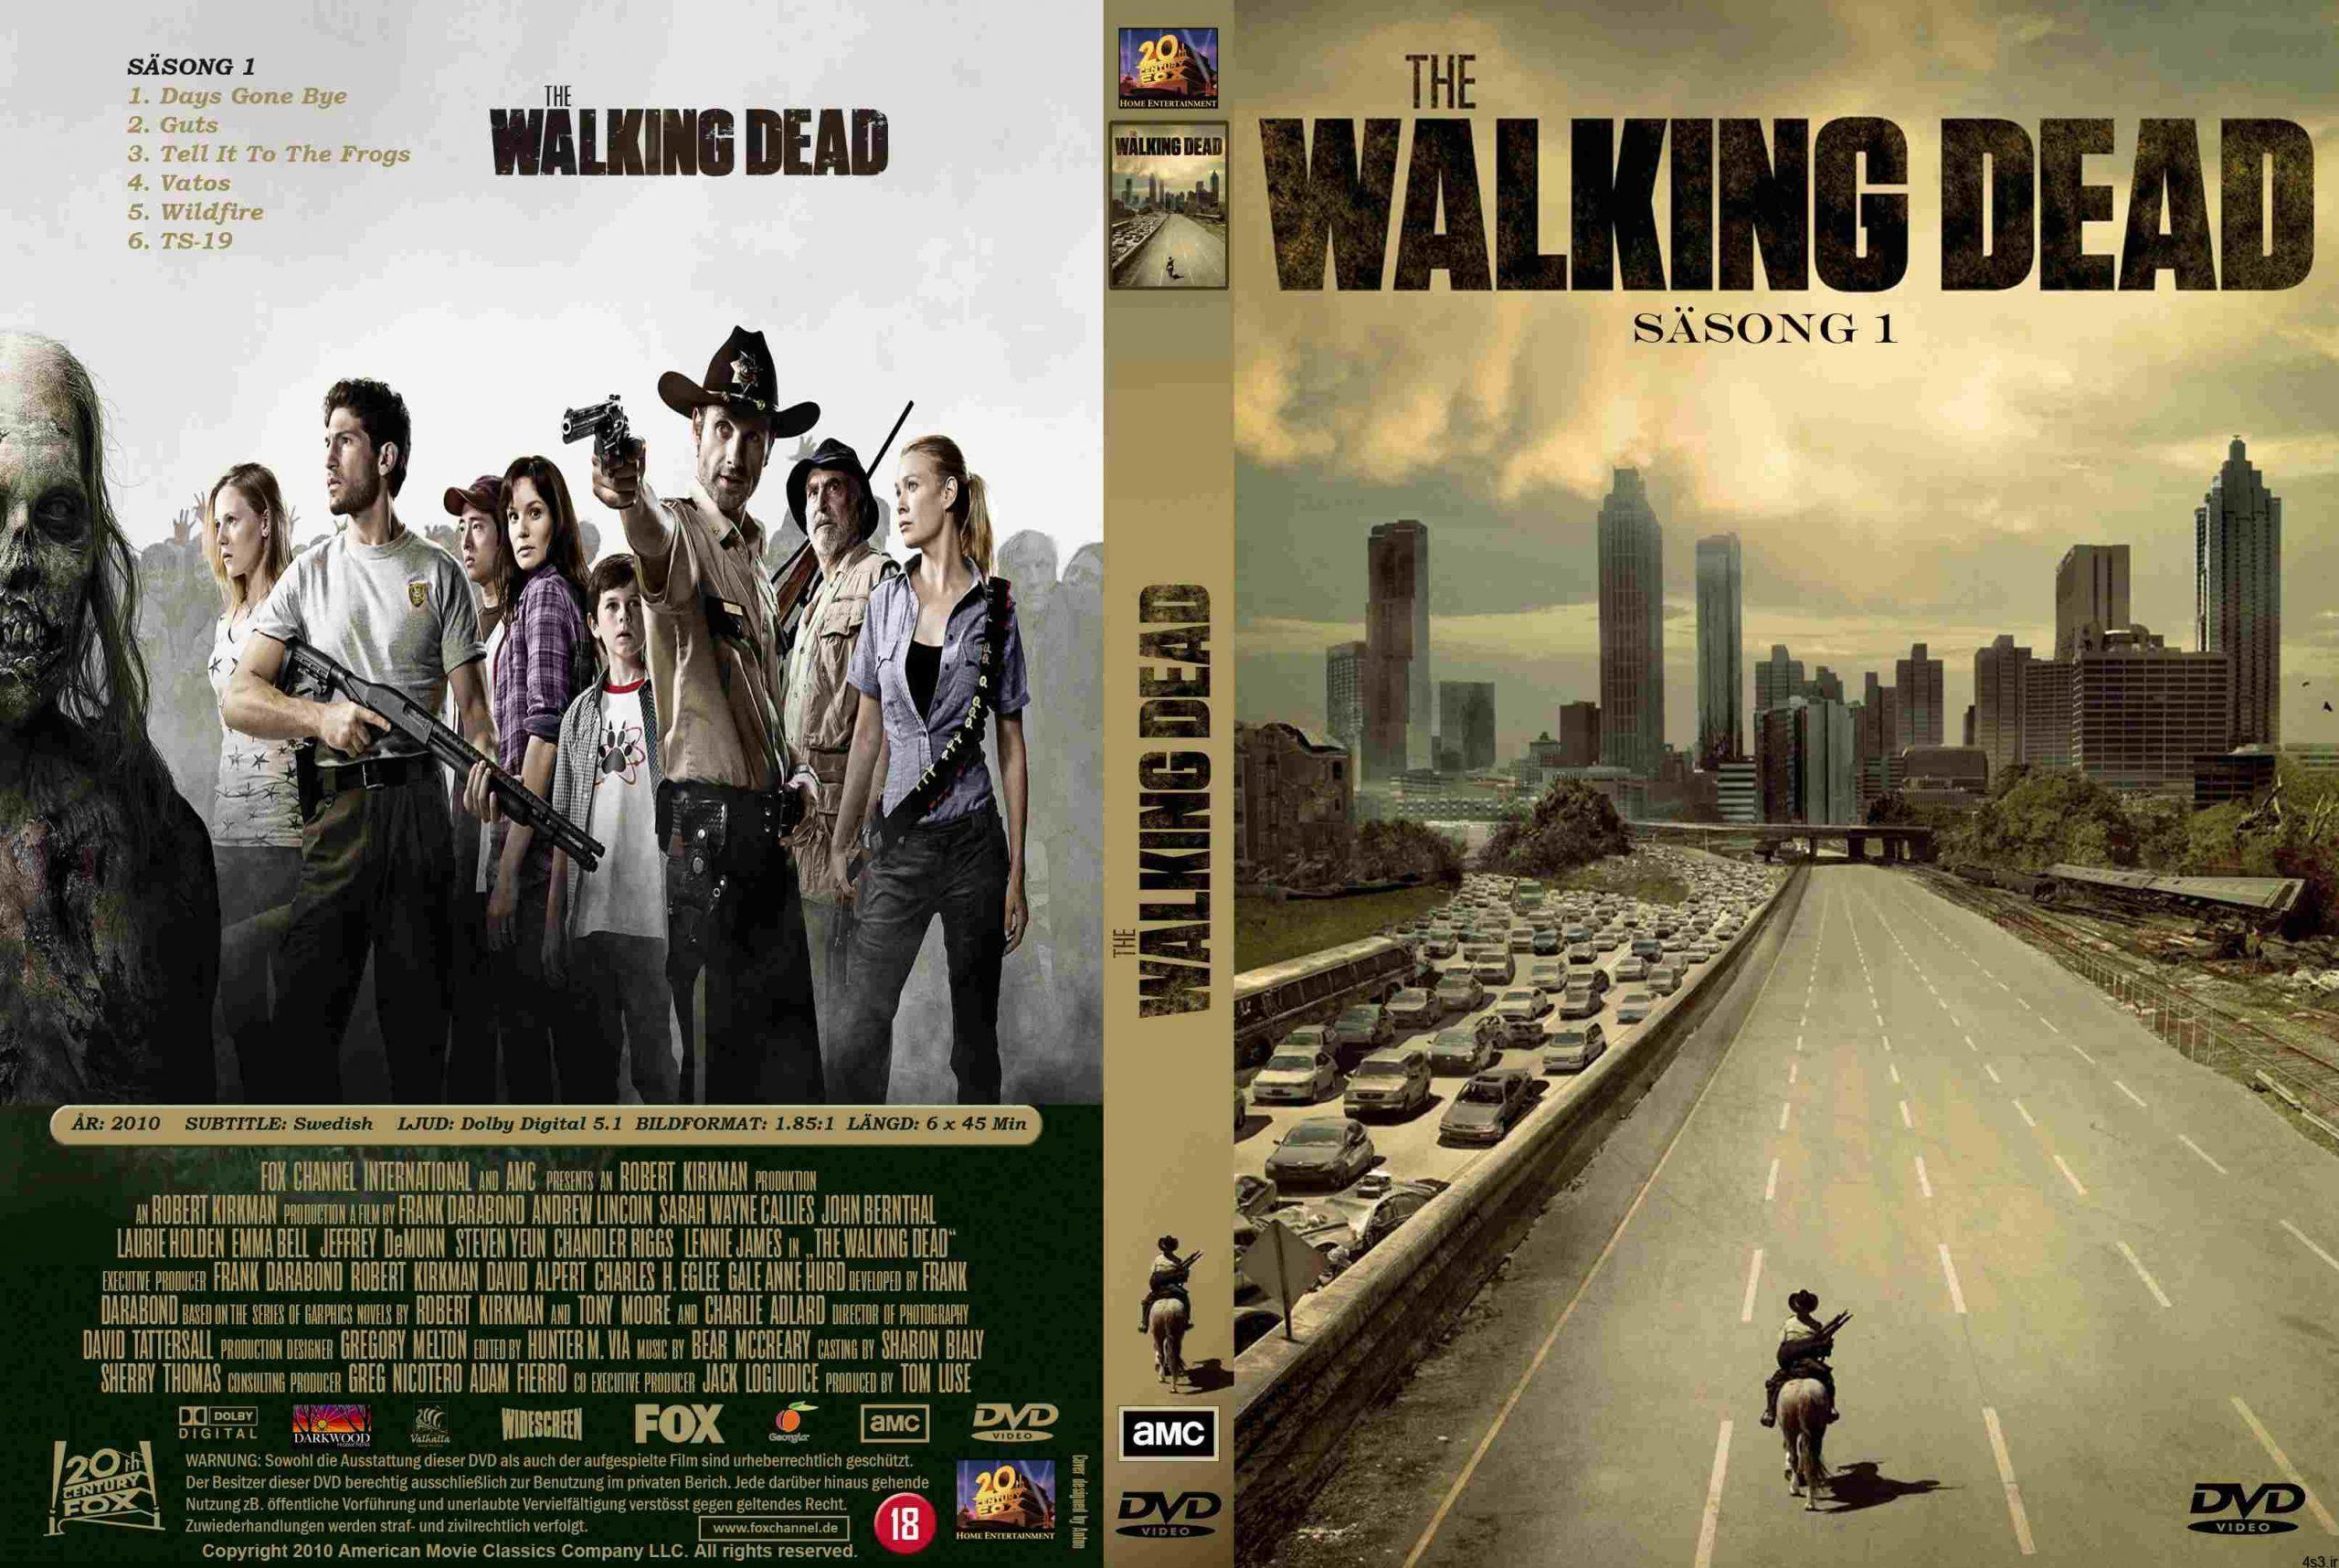 cover serial The Walking Dead 4s3.ir 3 scaled - سریال مردگان متحرک The Walking Dead  دوبله فارسی  فصل دوم قسمت ۶